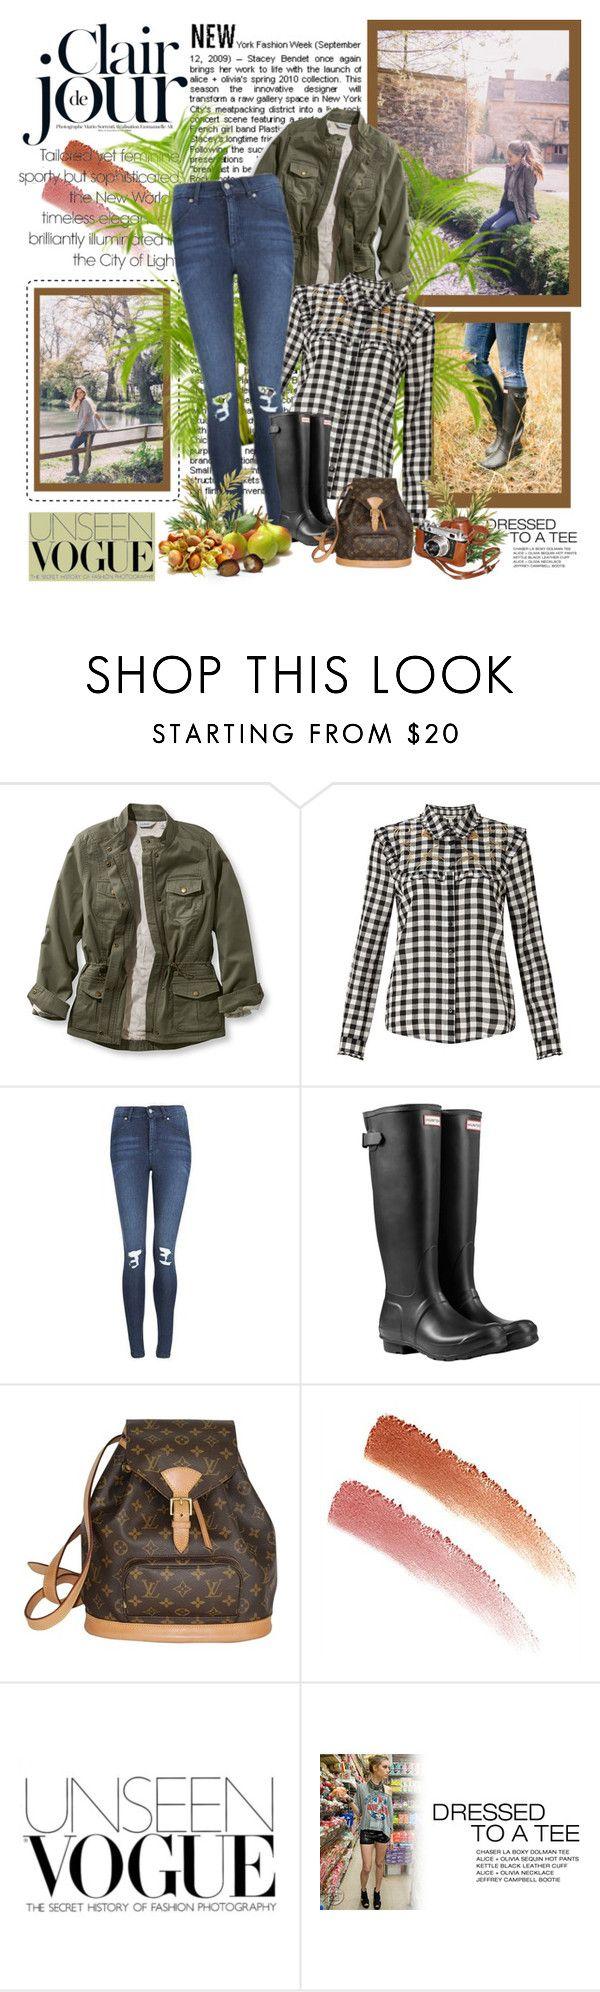 """Fall Rain Boots"" by malinda108 ❤ liked on Polyvore featuring Hunter, L.L.Bean, Miss Selfridge, Cheap Monday, Louis Vuitton, NARS Cosmetics, rainboots and galmeetsglam"